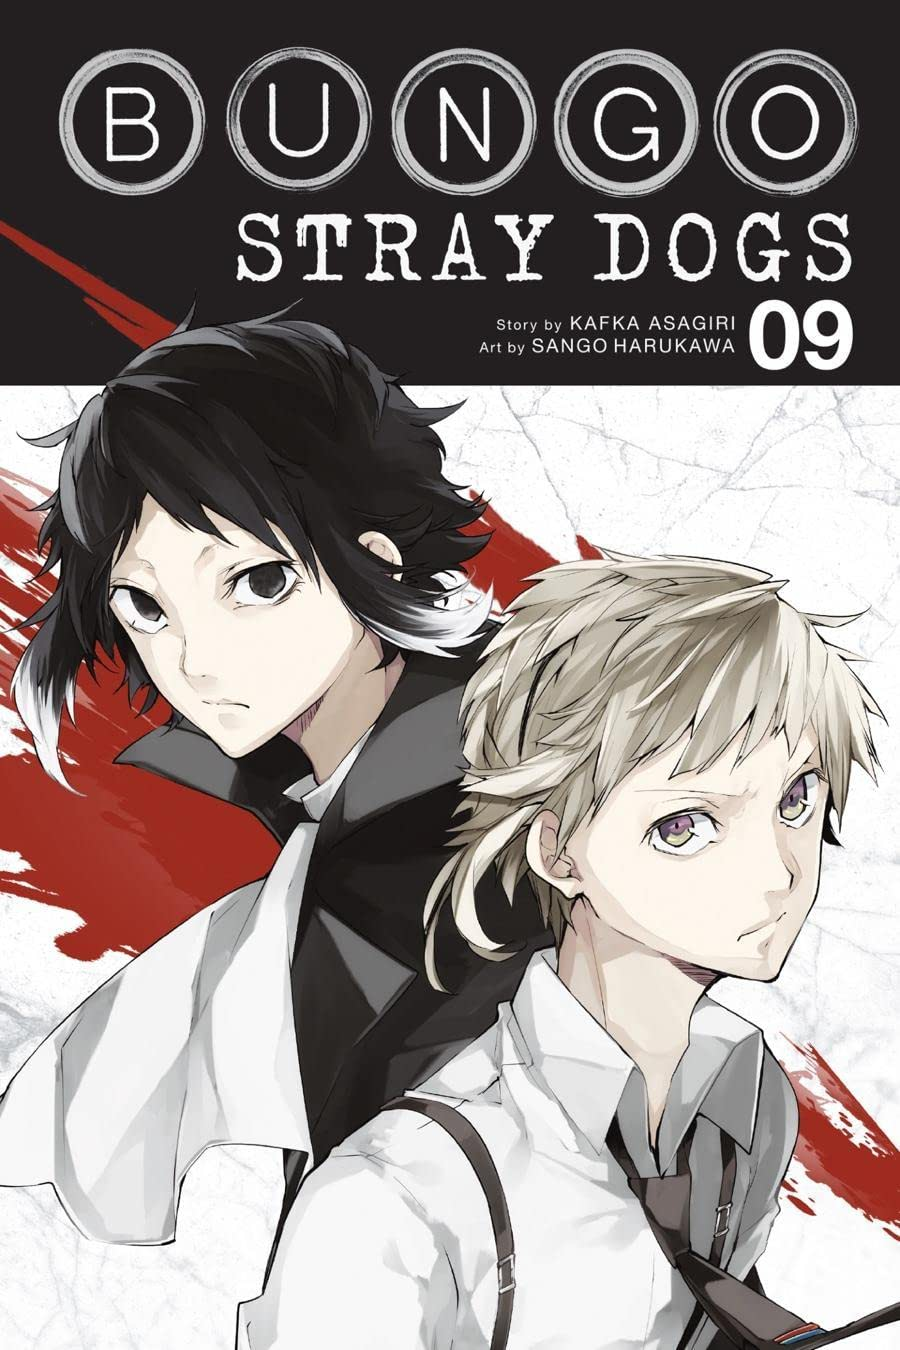 Bungo Stray Dogs Vol. 9